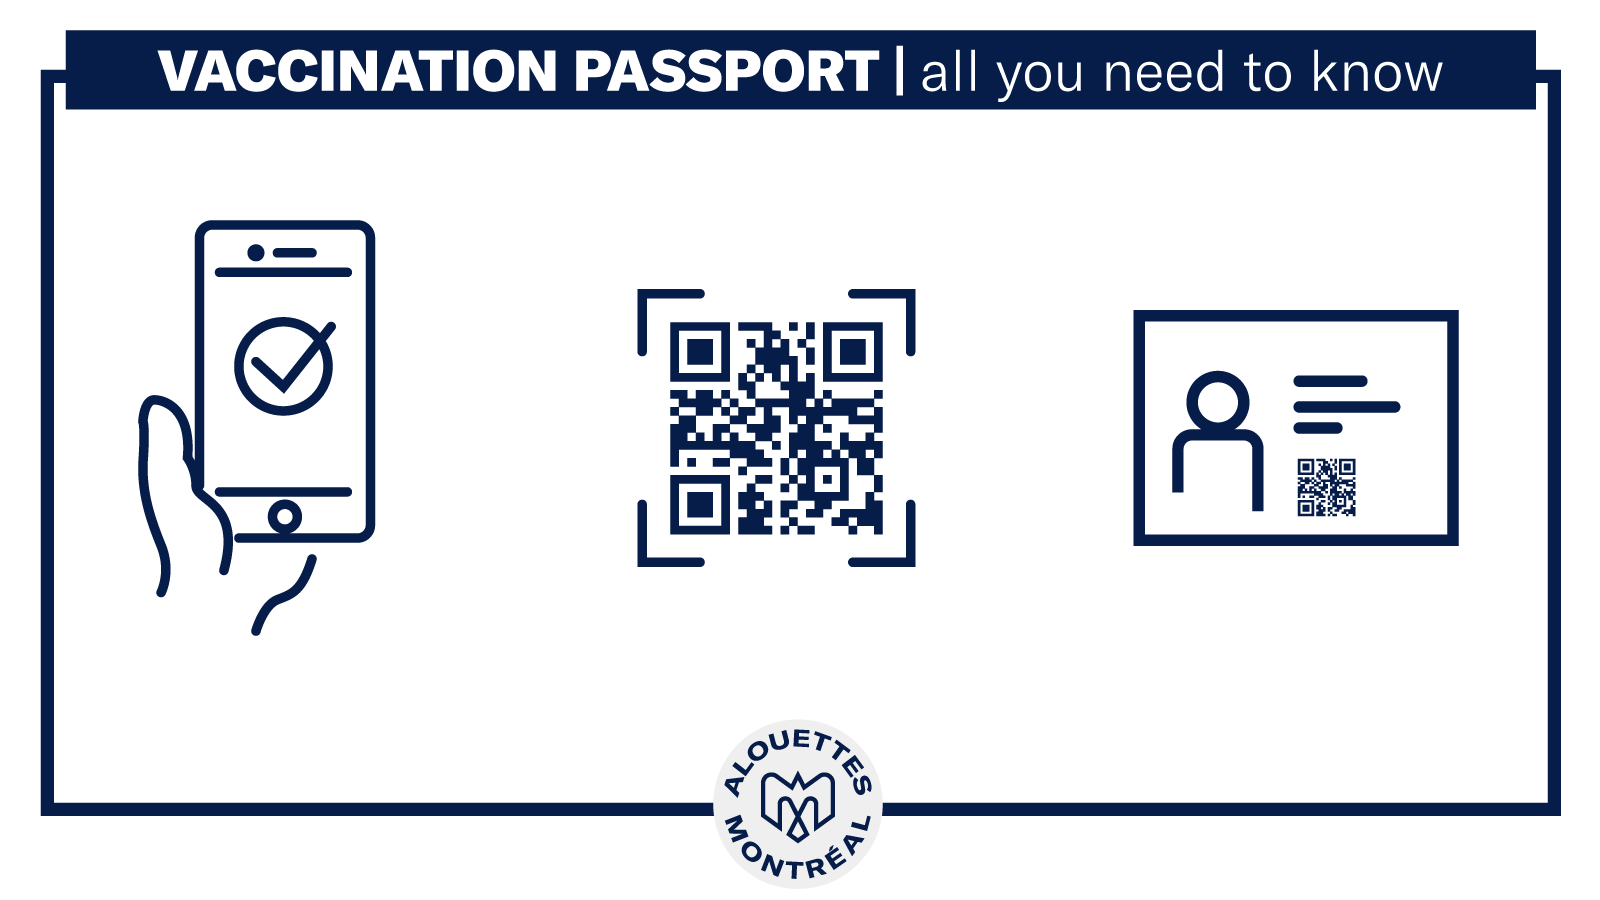 Vaccination Passport